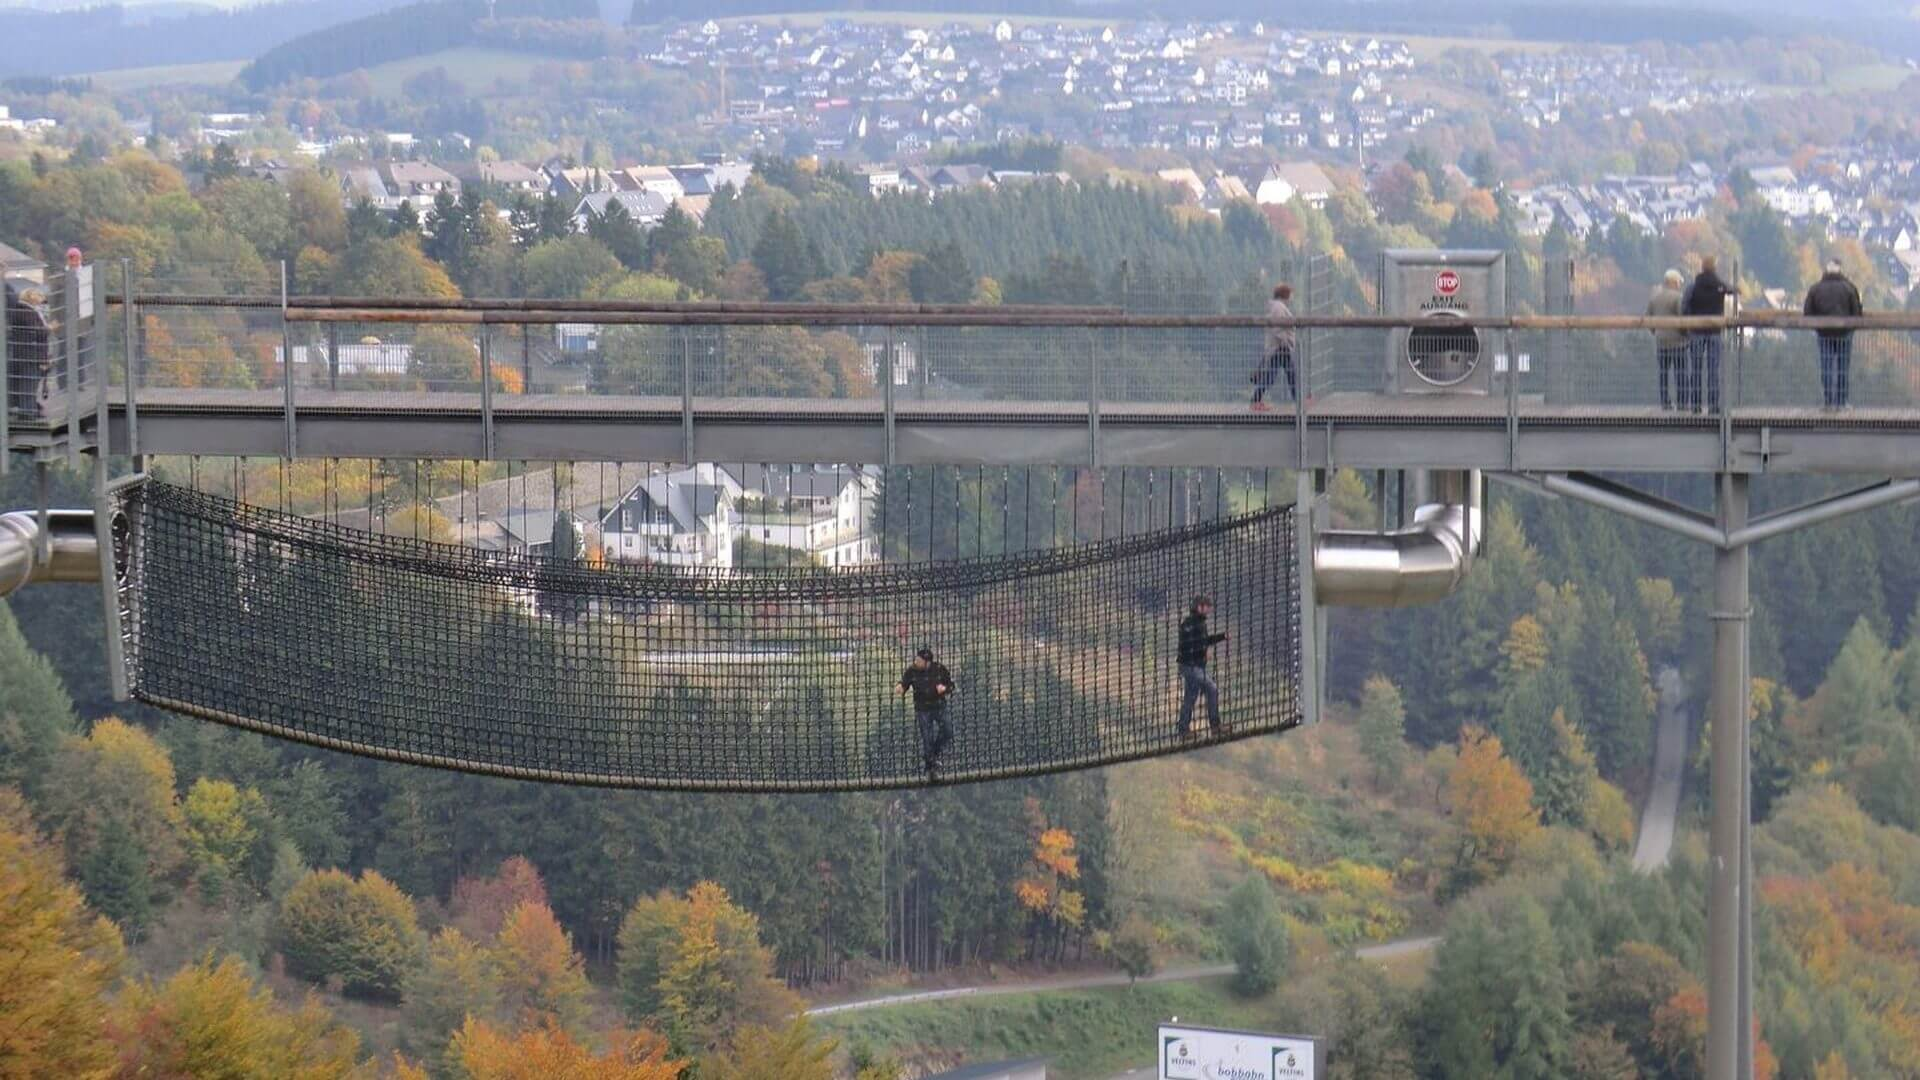 Panorama Erlebnis Brücke am Erlebnisberg Kappe in Winterberg